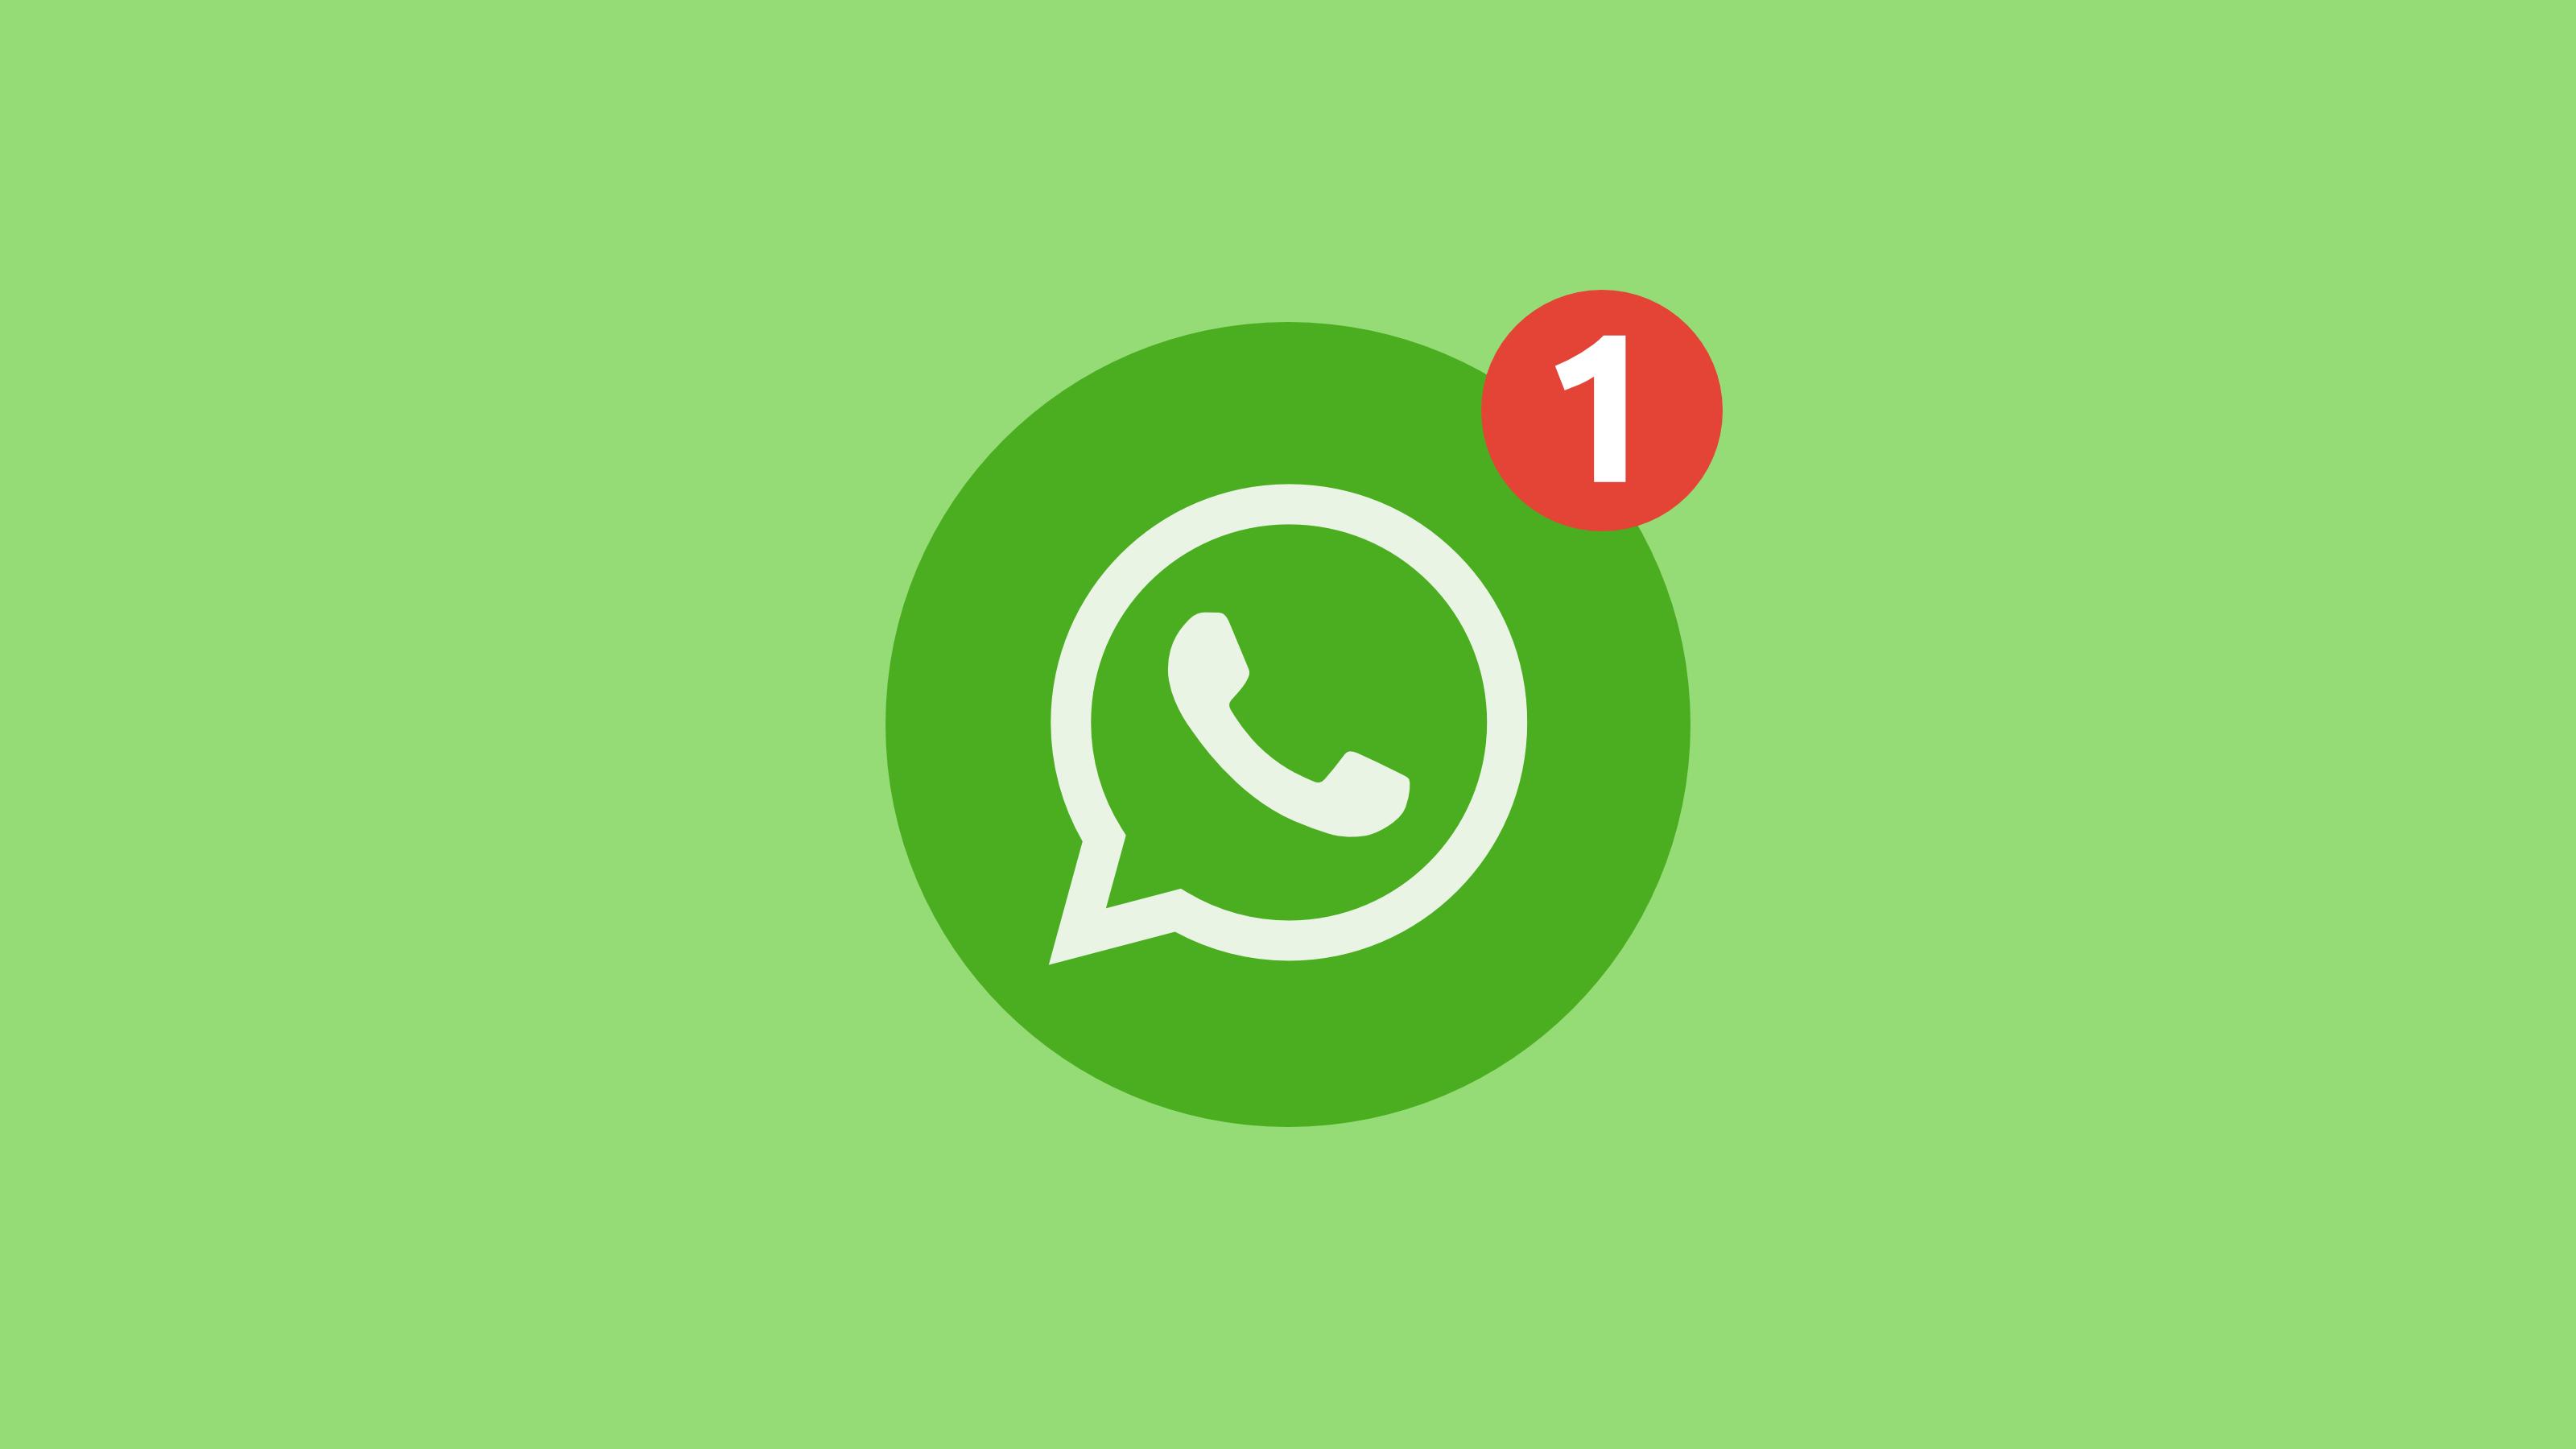 Cara Membuka Whatsapp Web tanpa Kode QR